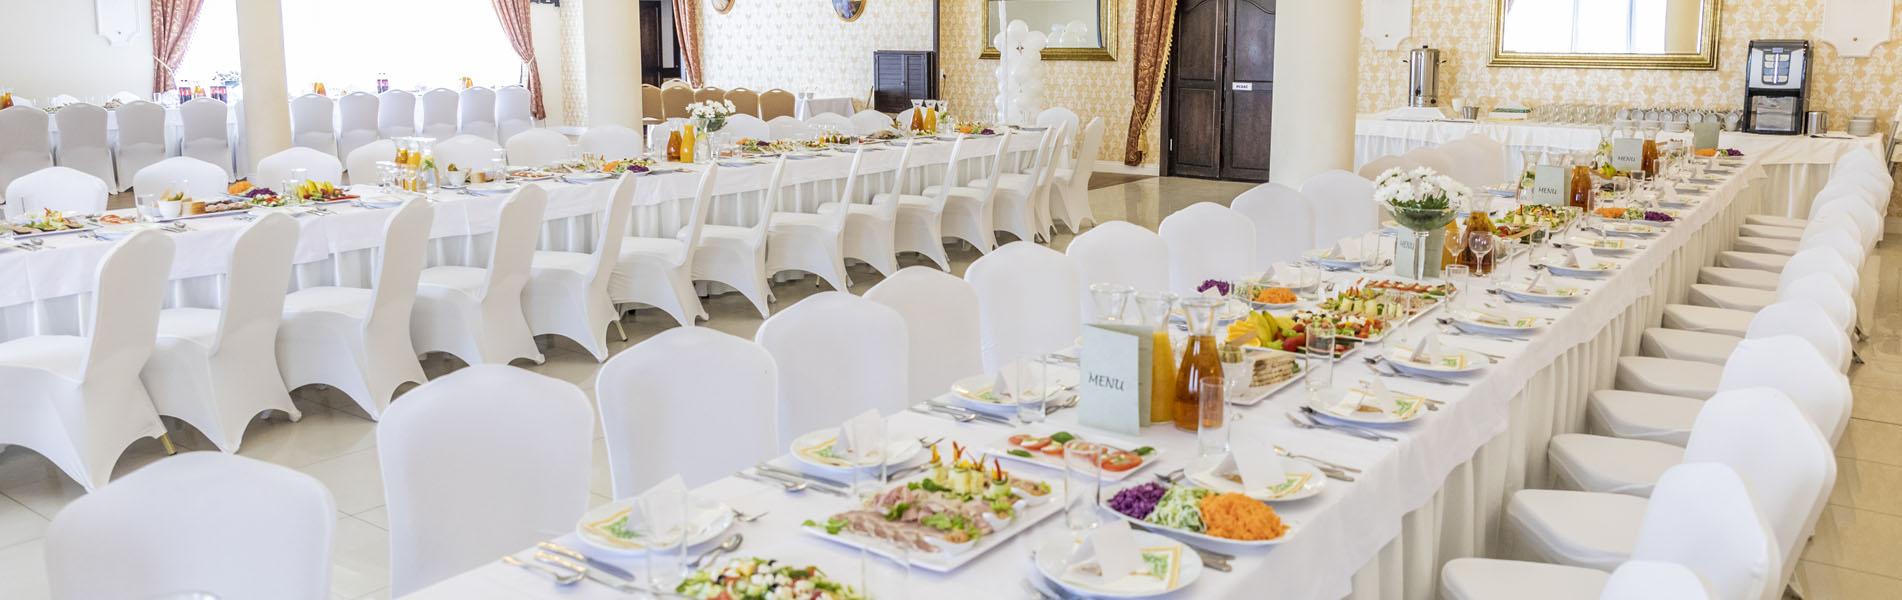 Komunia 2021 w Malaga Sala